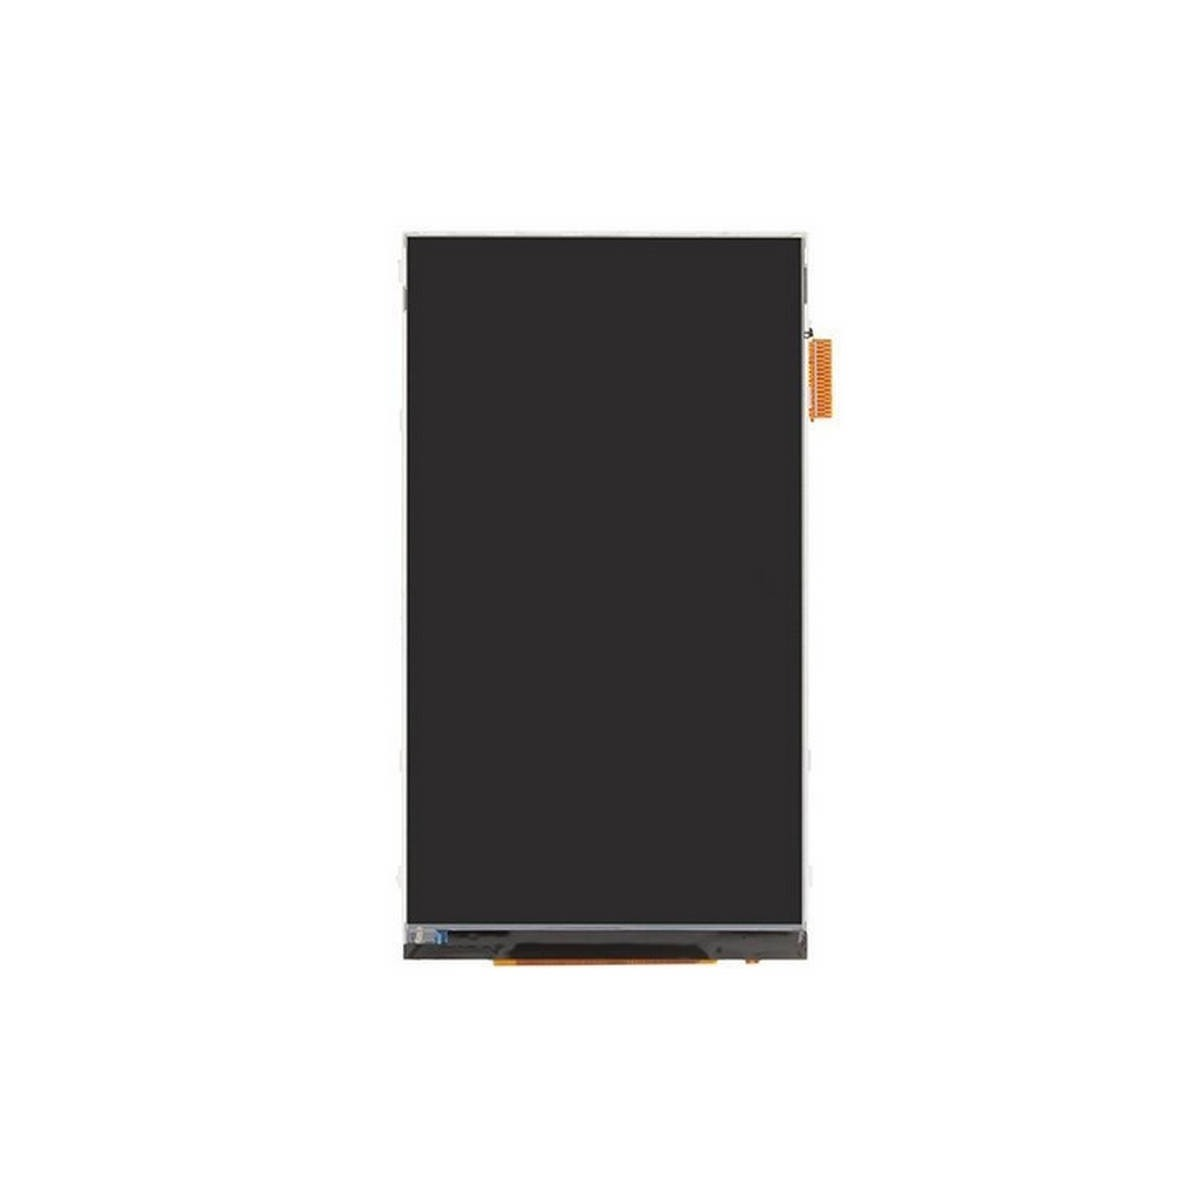 LCD SONY XPERIA J ST26I